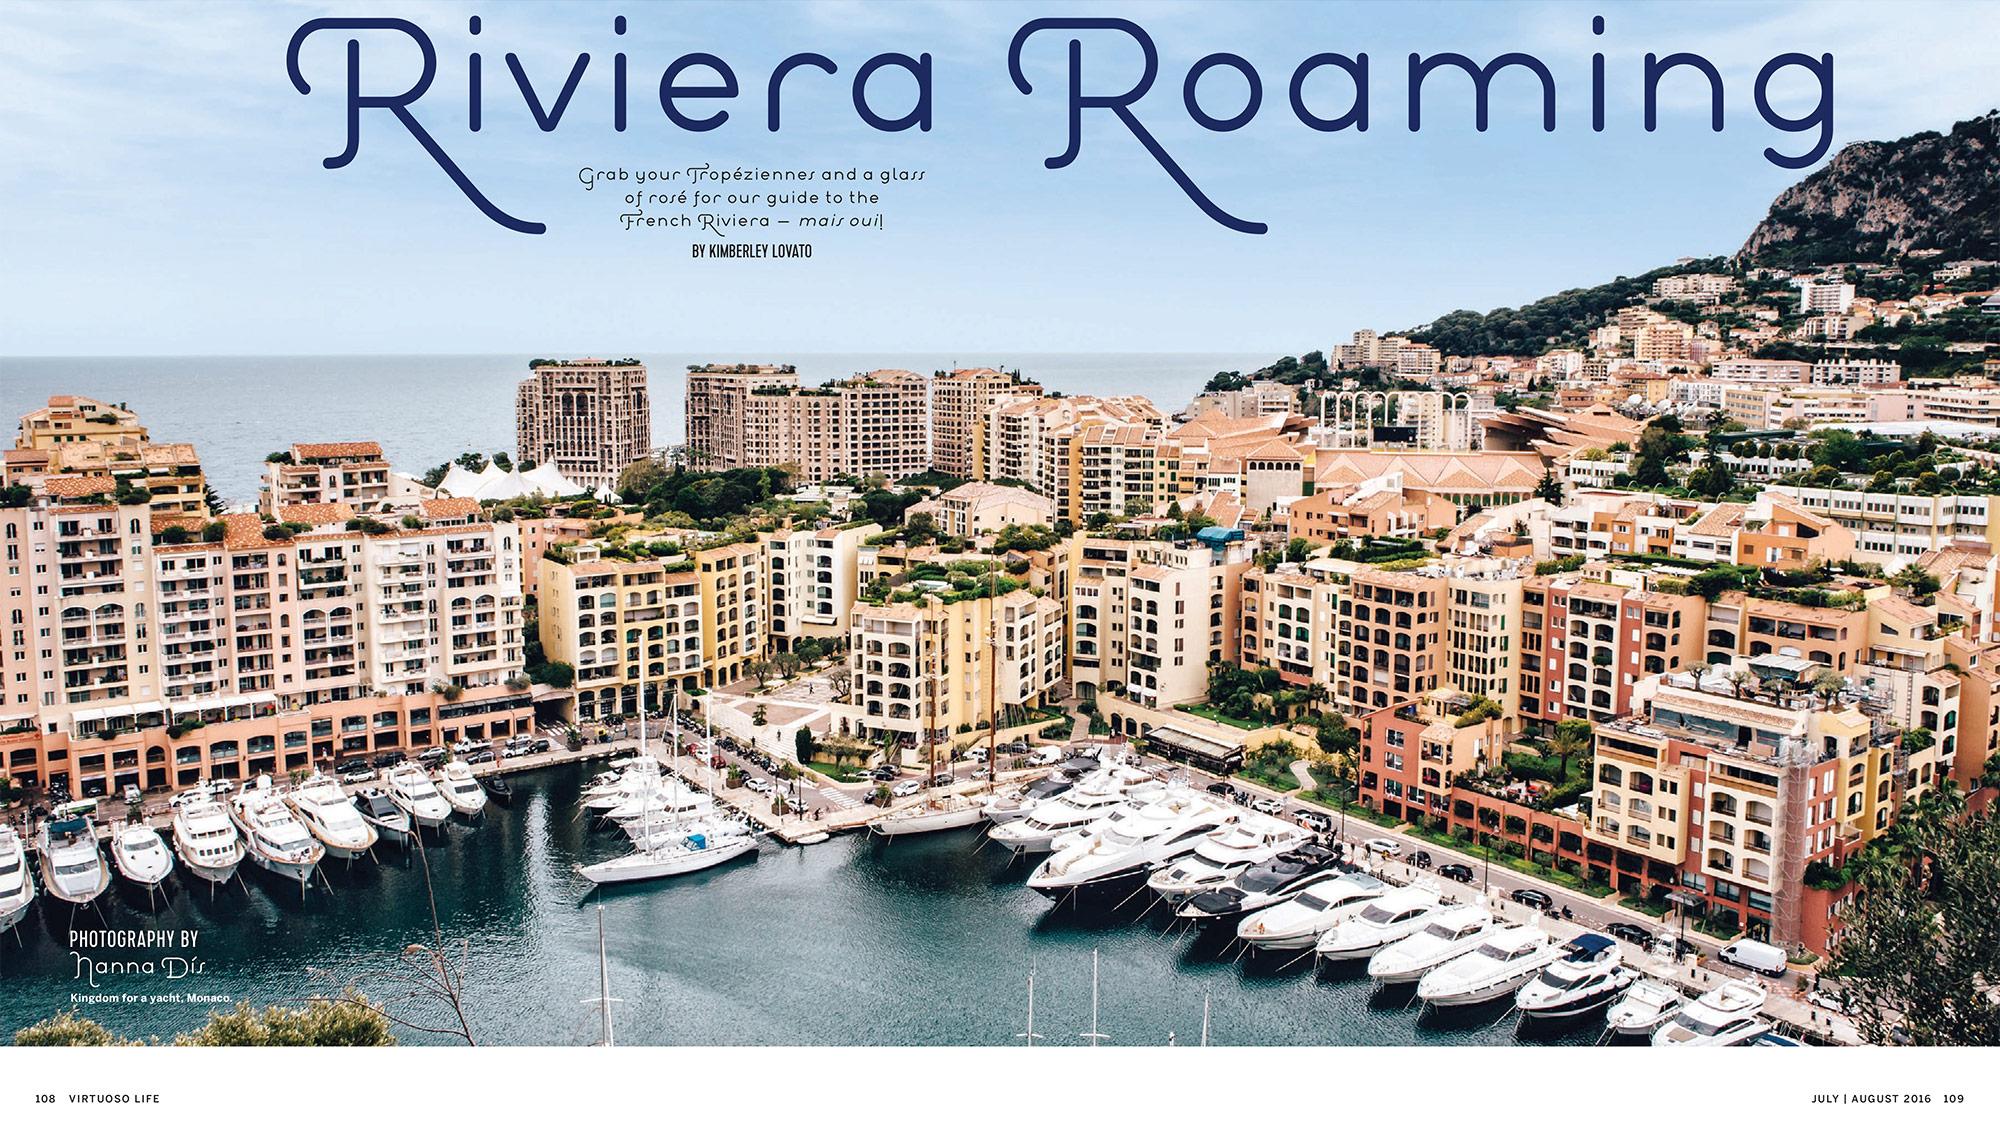 Virtuoso Life magazine_French Riviera_c Nanna Dis 2016.jpg